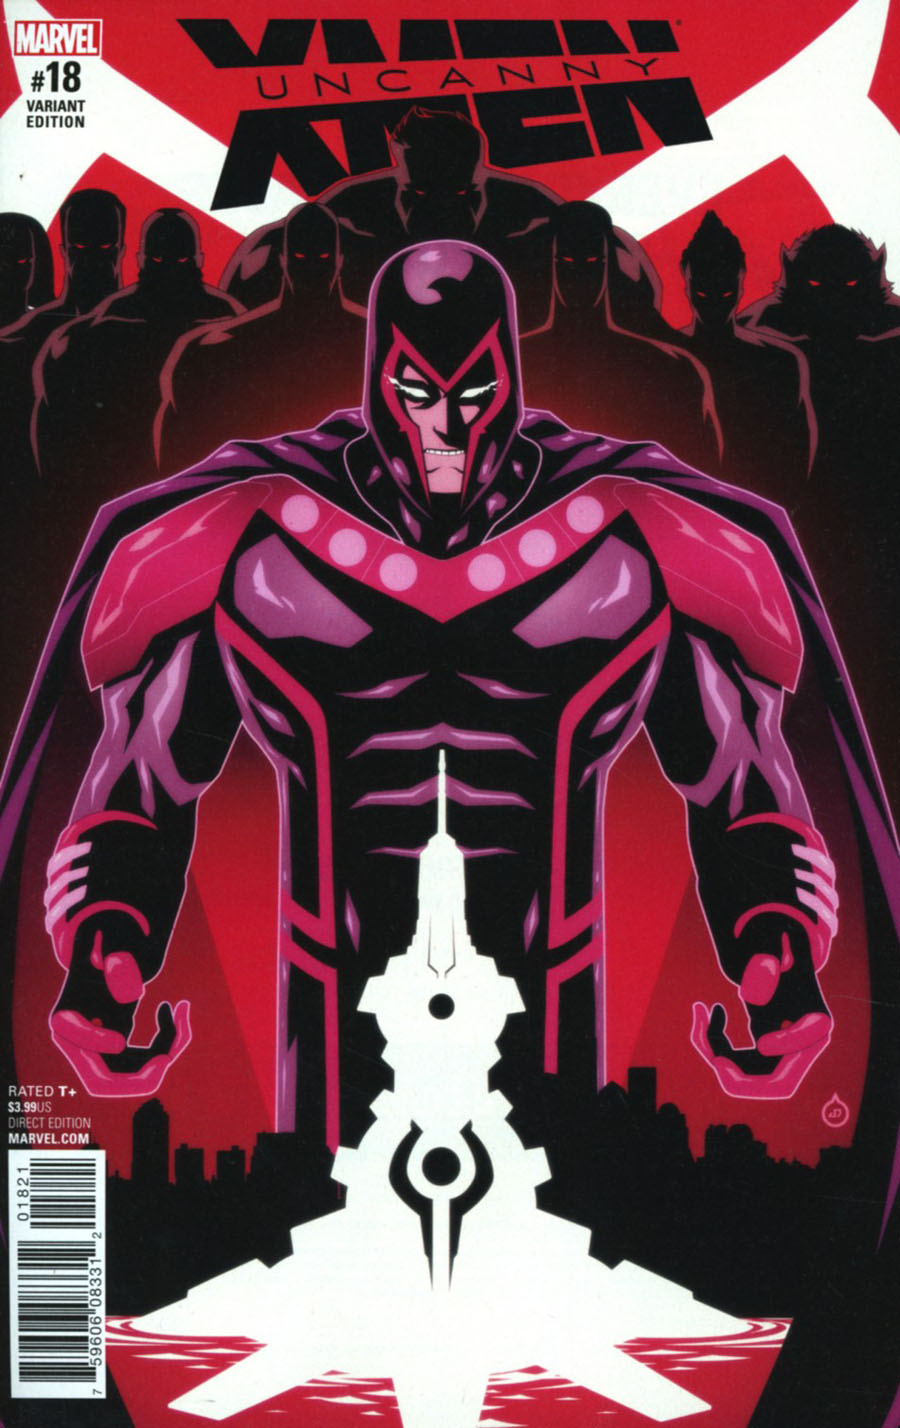 Uncanny X-Men Vol 4 #18 Cover B Incentive Juan Doe IvX Variant Cover (Inhumans vs X-Men Tie-In)